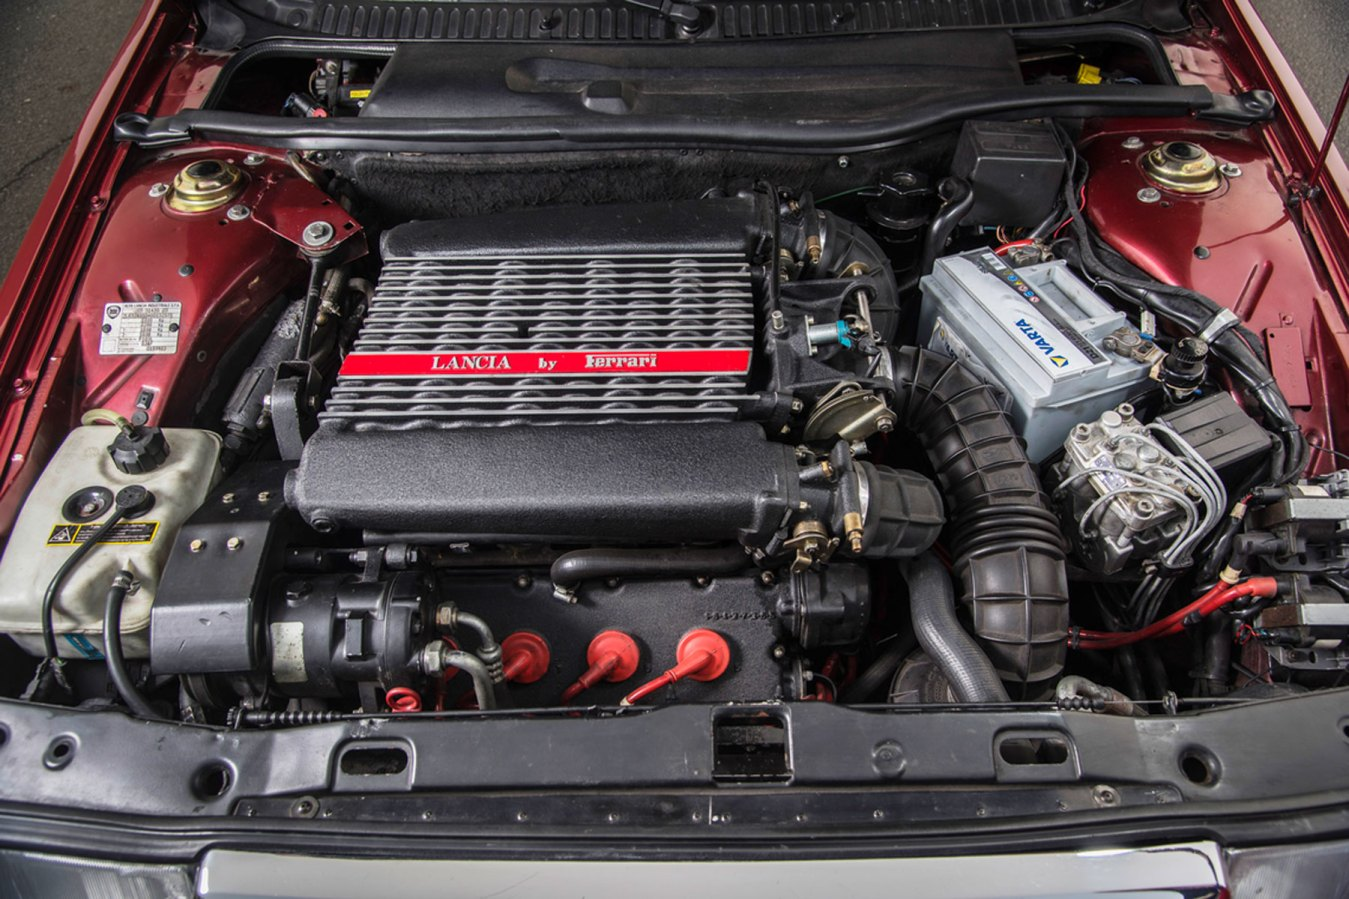 Lancia Thema 8.32 engine